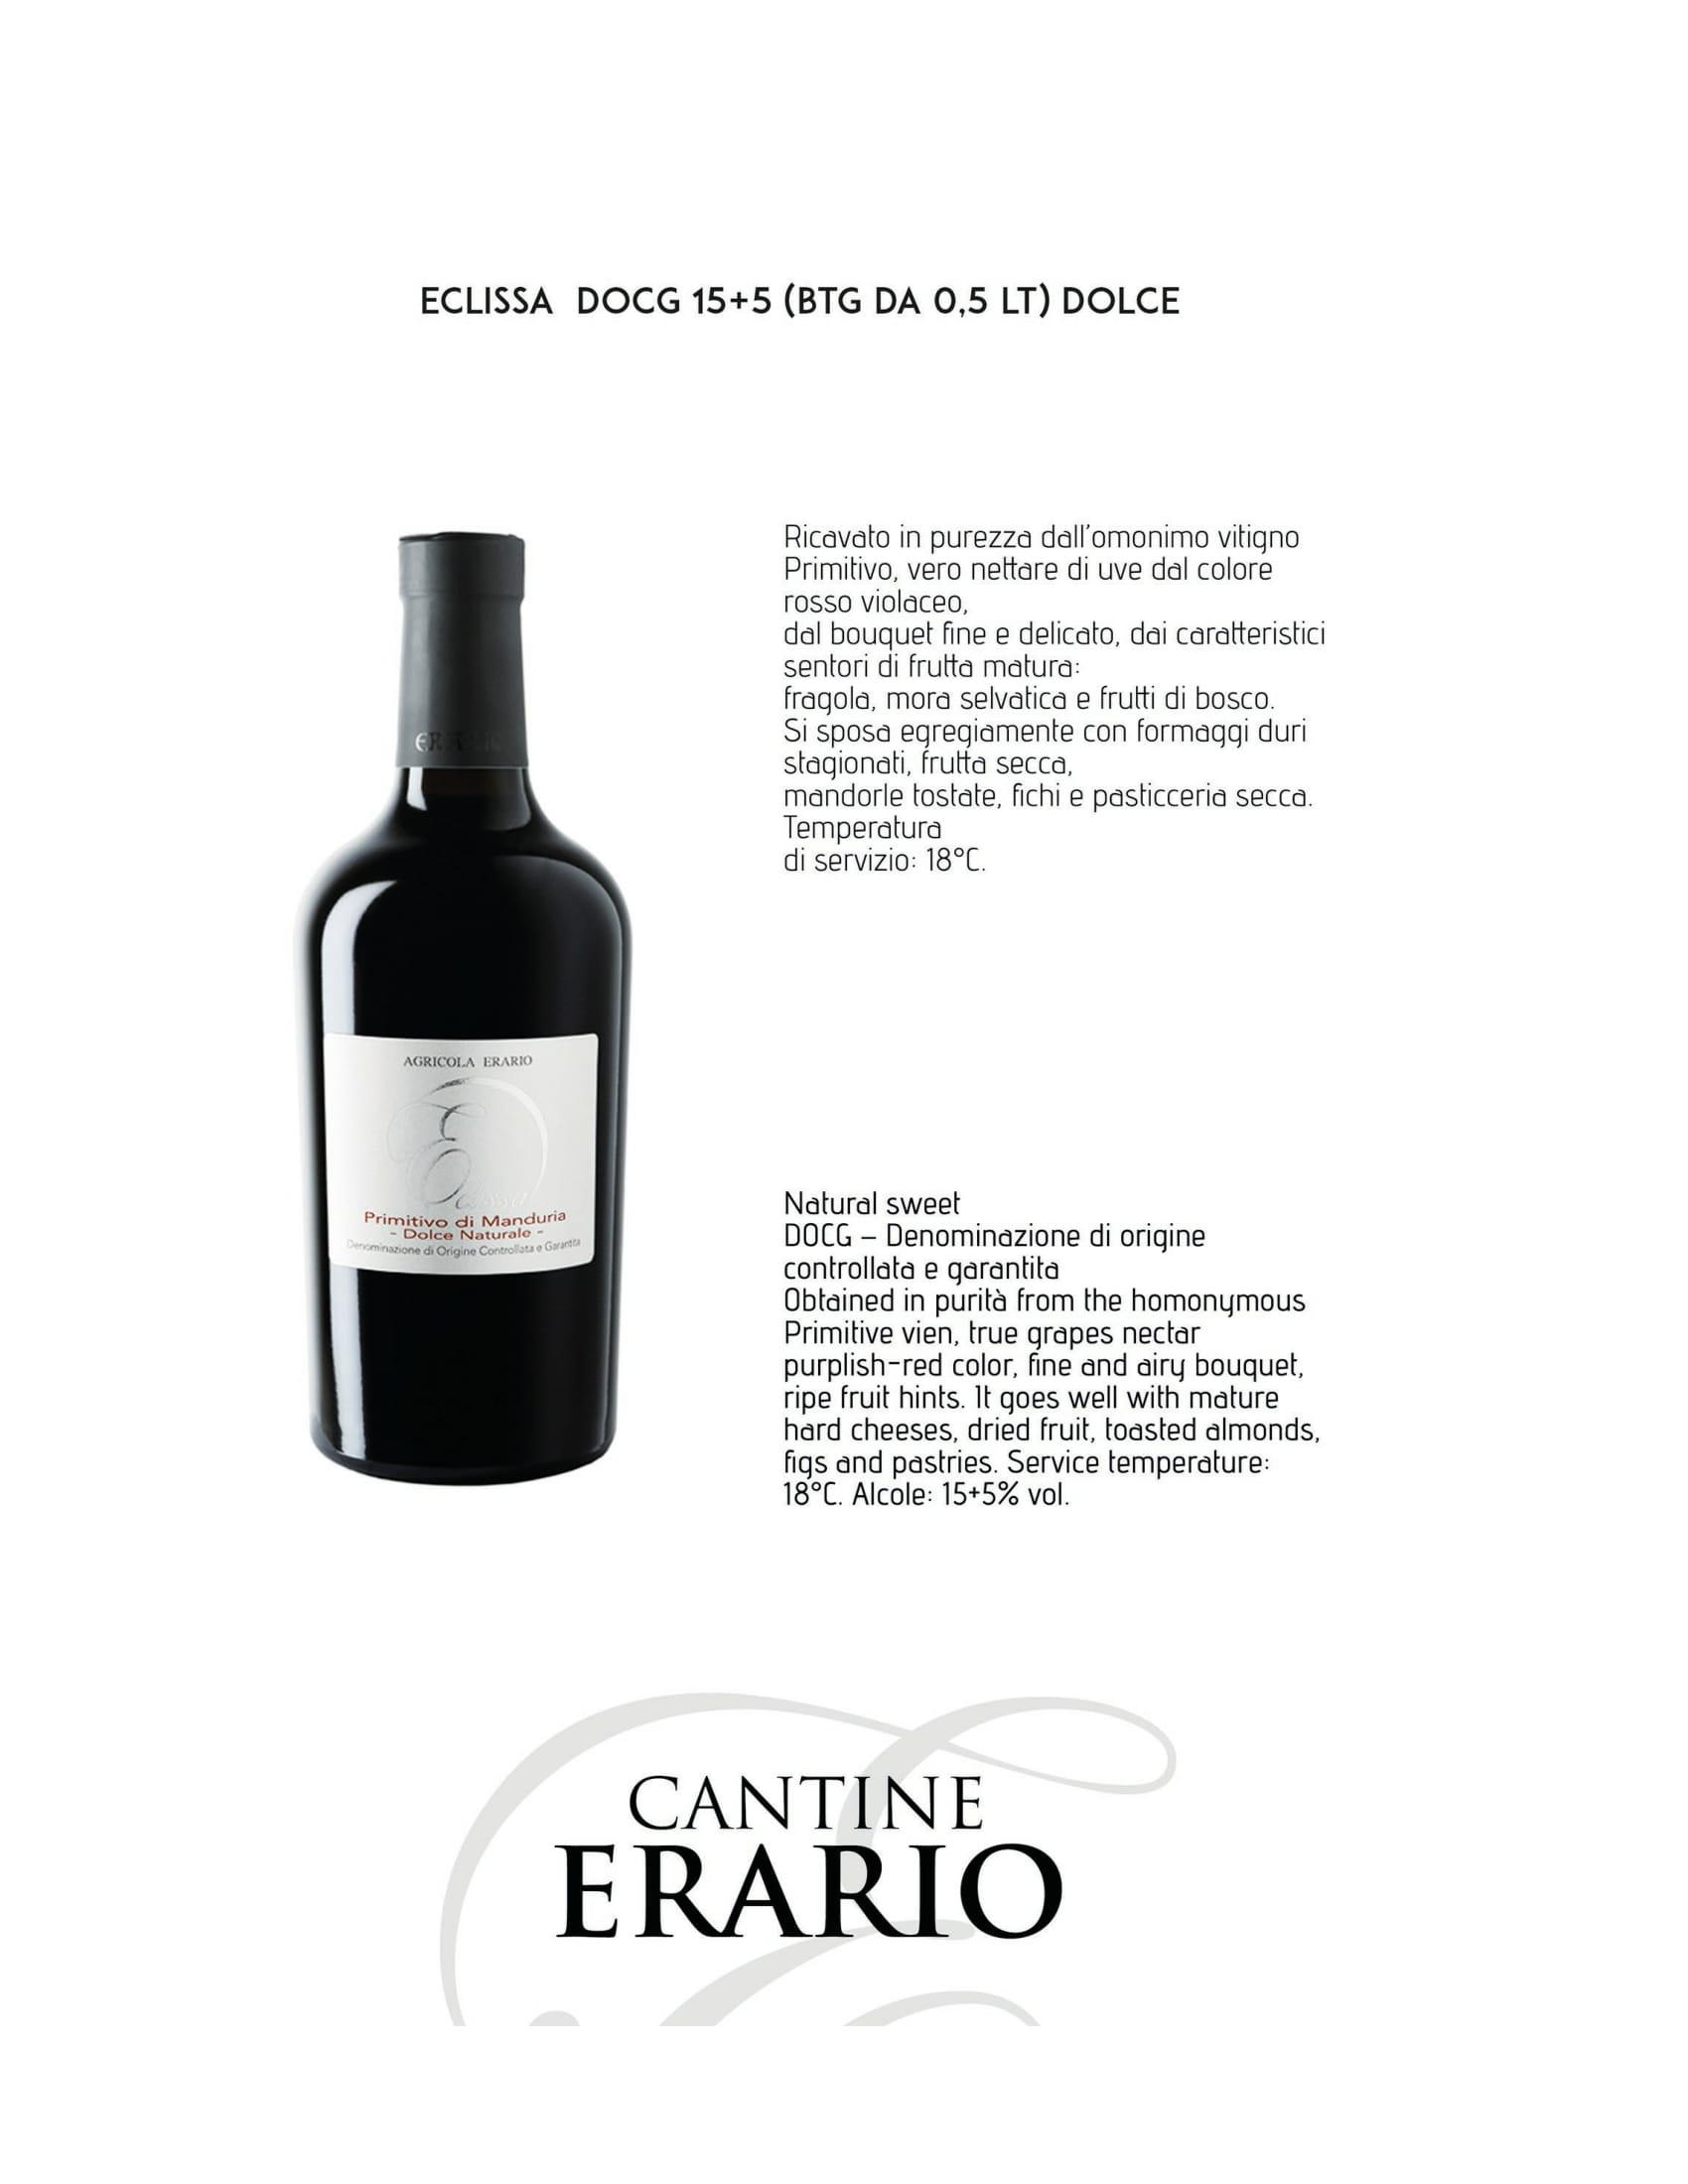 erario vino dolce-1jpg